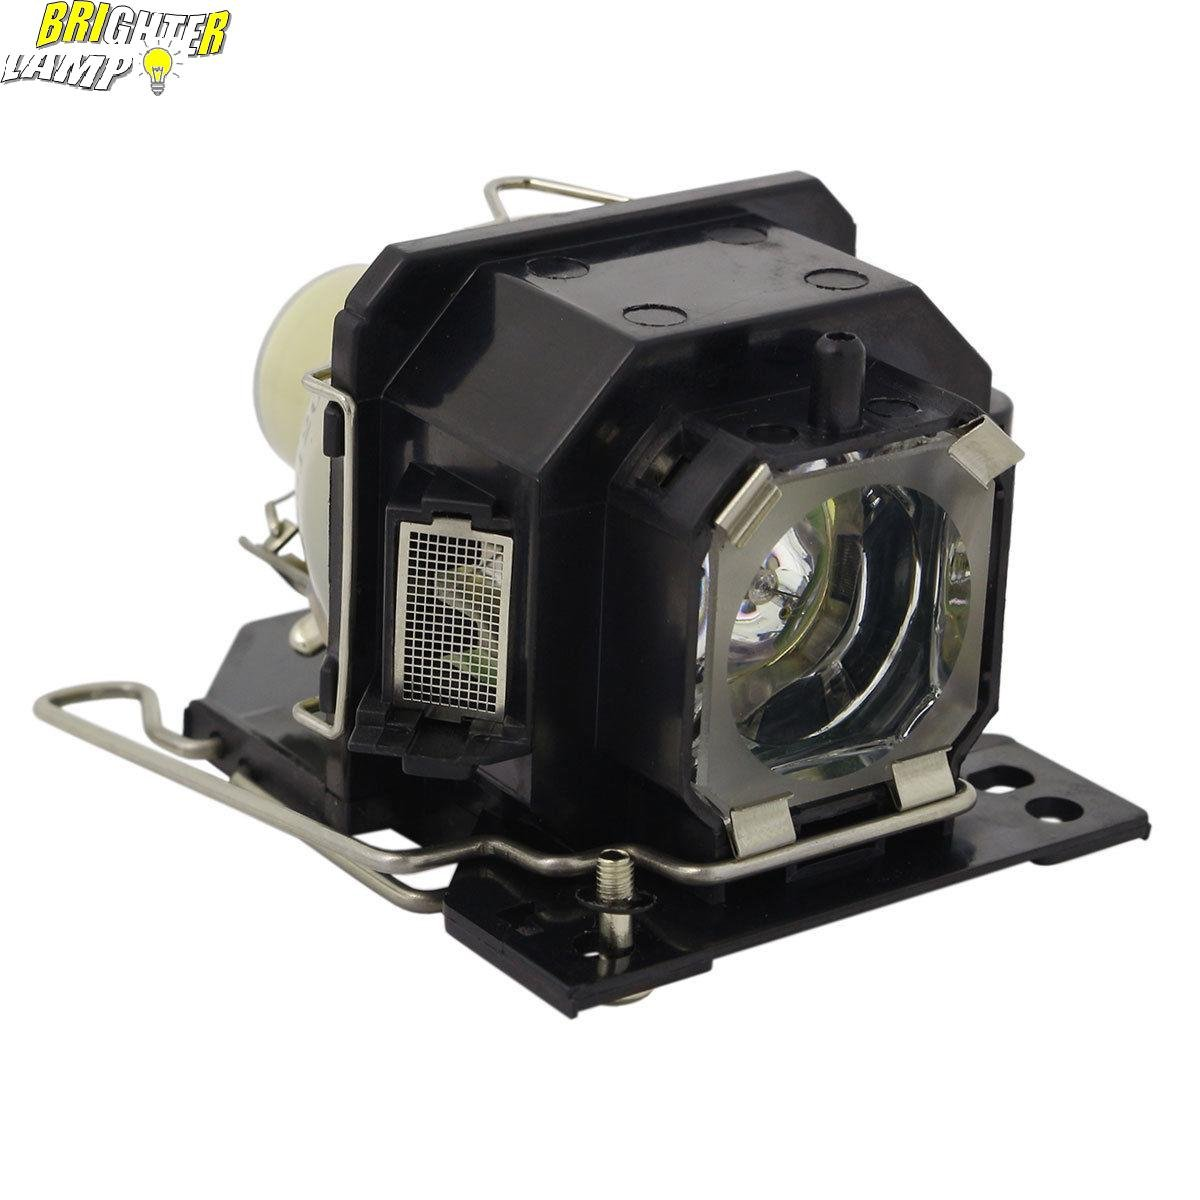 Brighter Lamp DT00781 / RLC-027 プロジェクターランプ 【ハウジング付き/高輝度/長寿命】for Hitachi日立 交換用 B0799GCGNZ